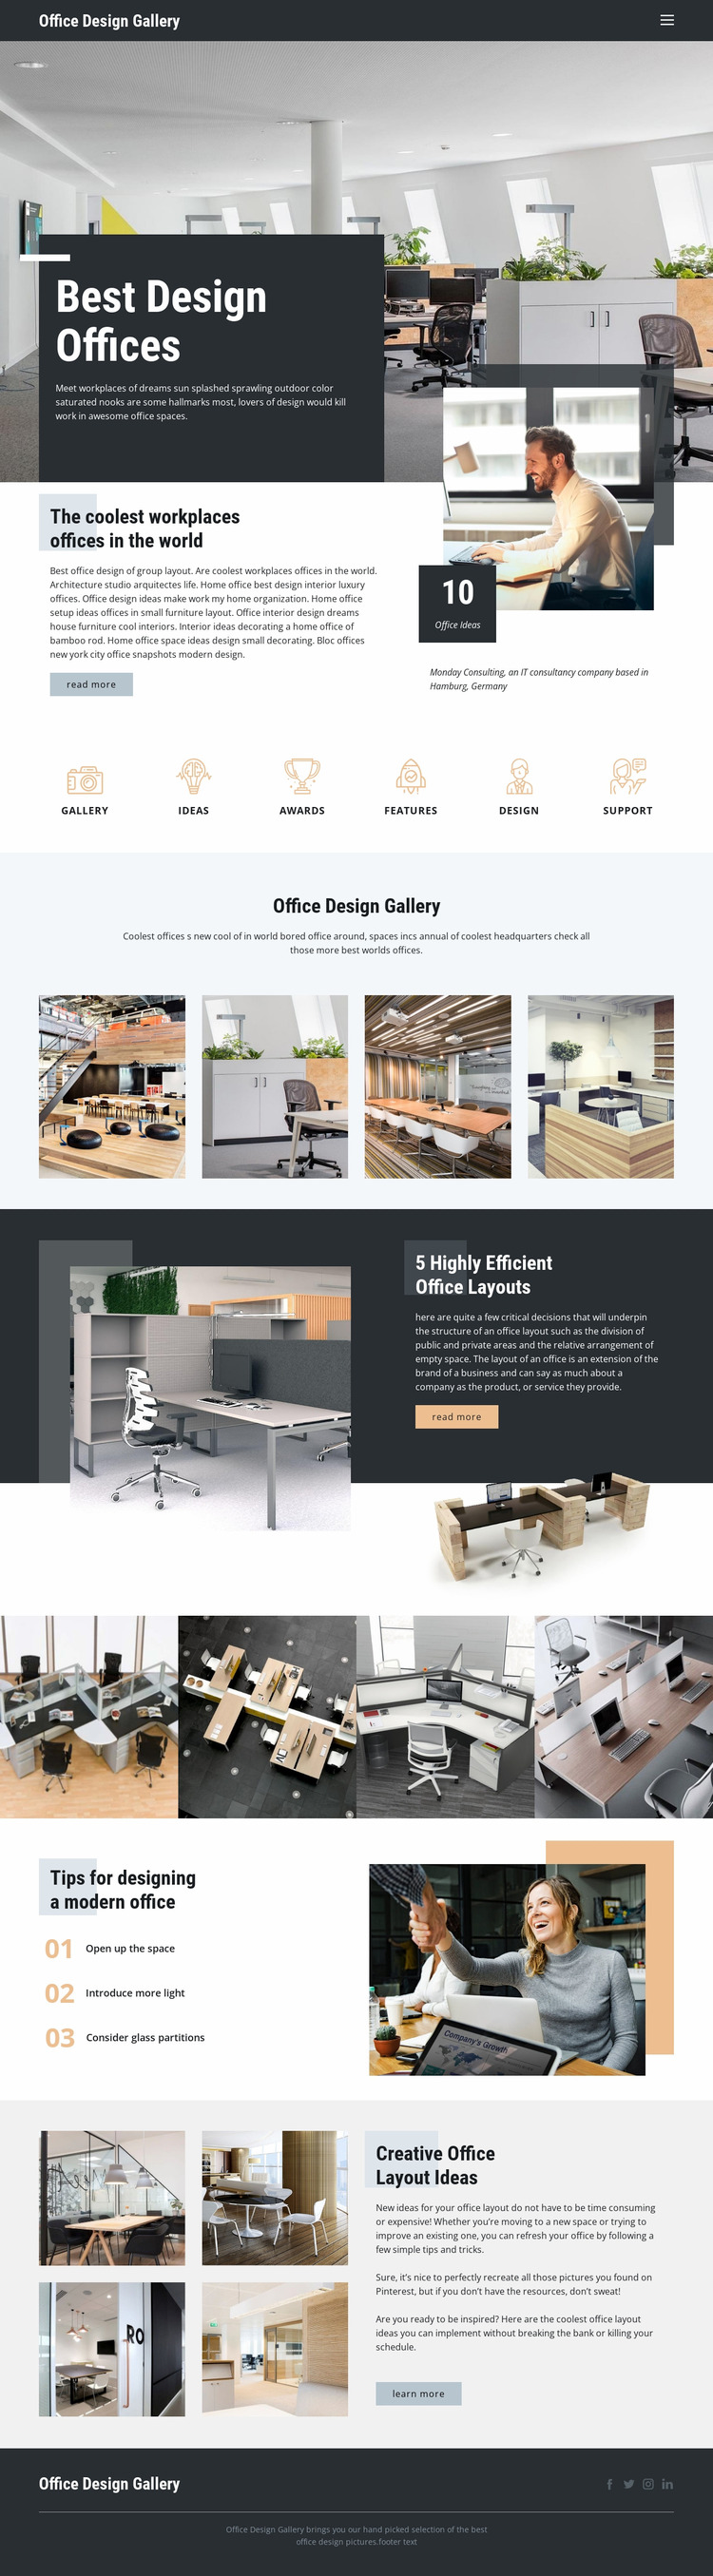 Best Design Offices WordPress Website Builder